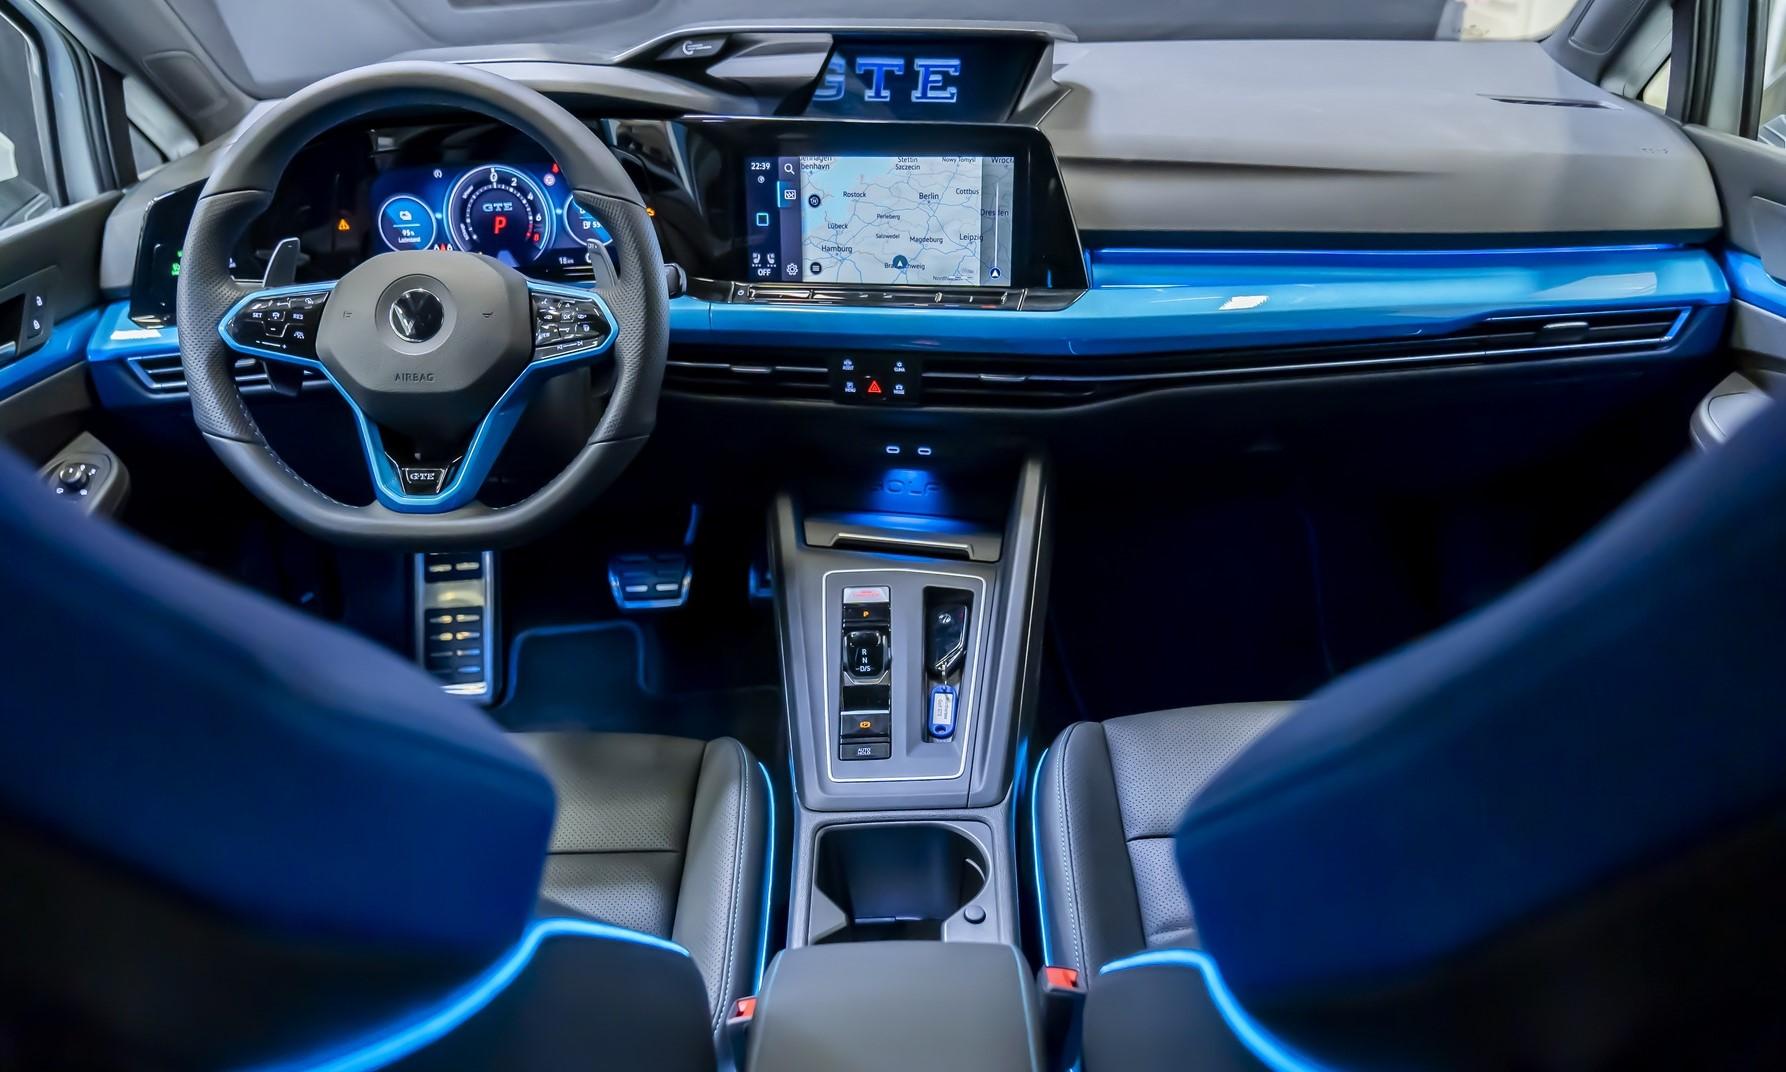 VW Golf GTE Skylight interior